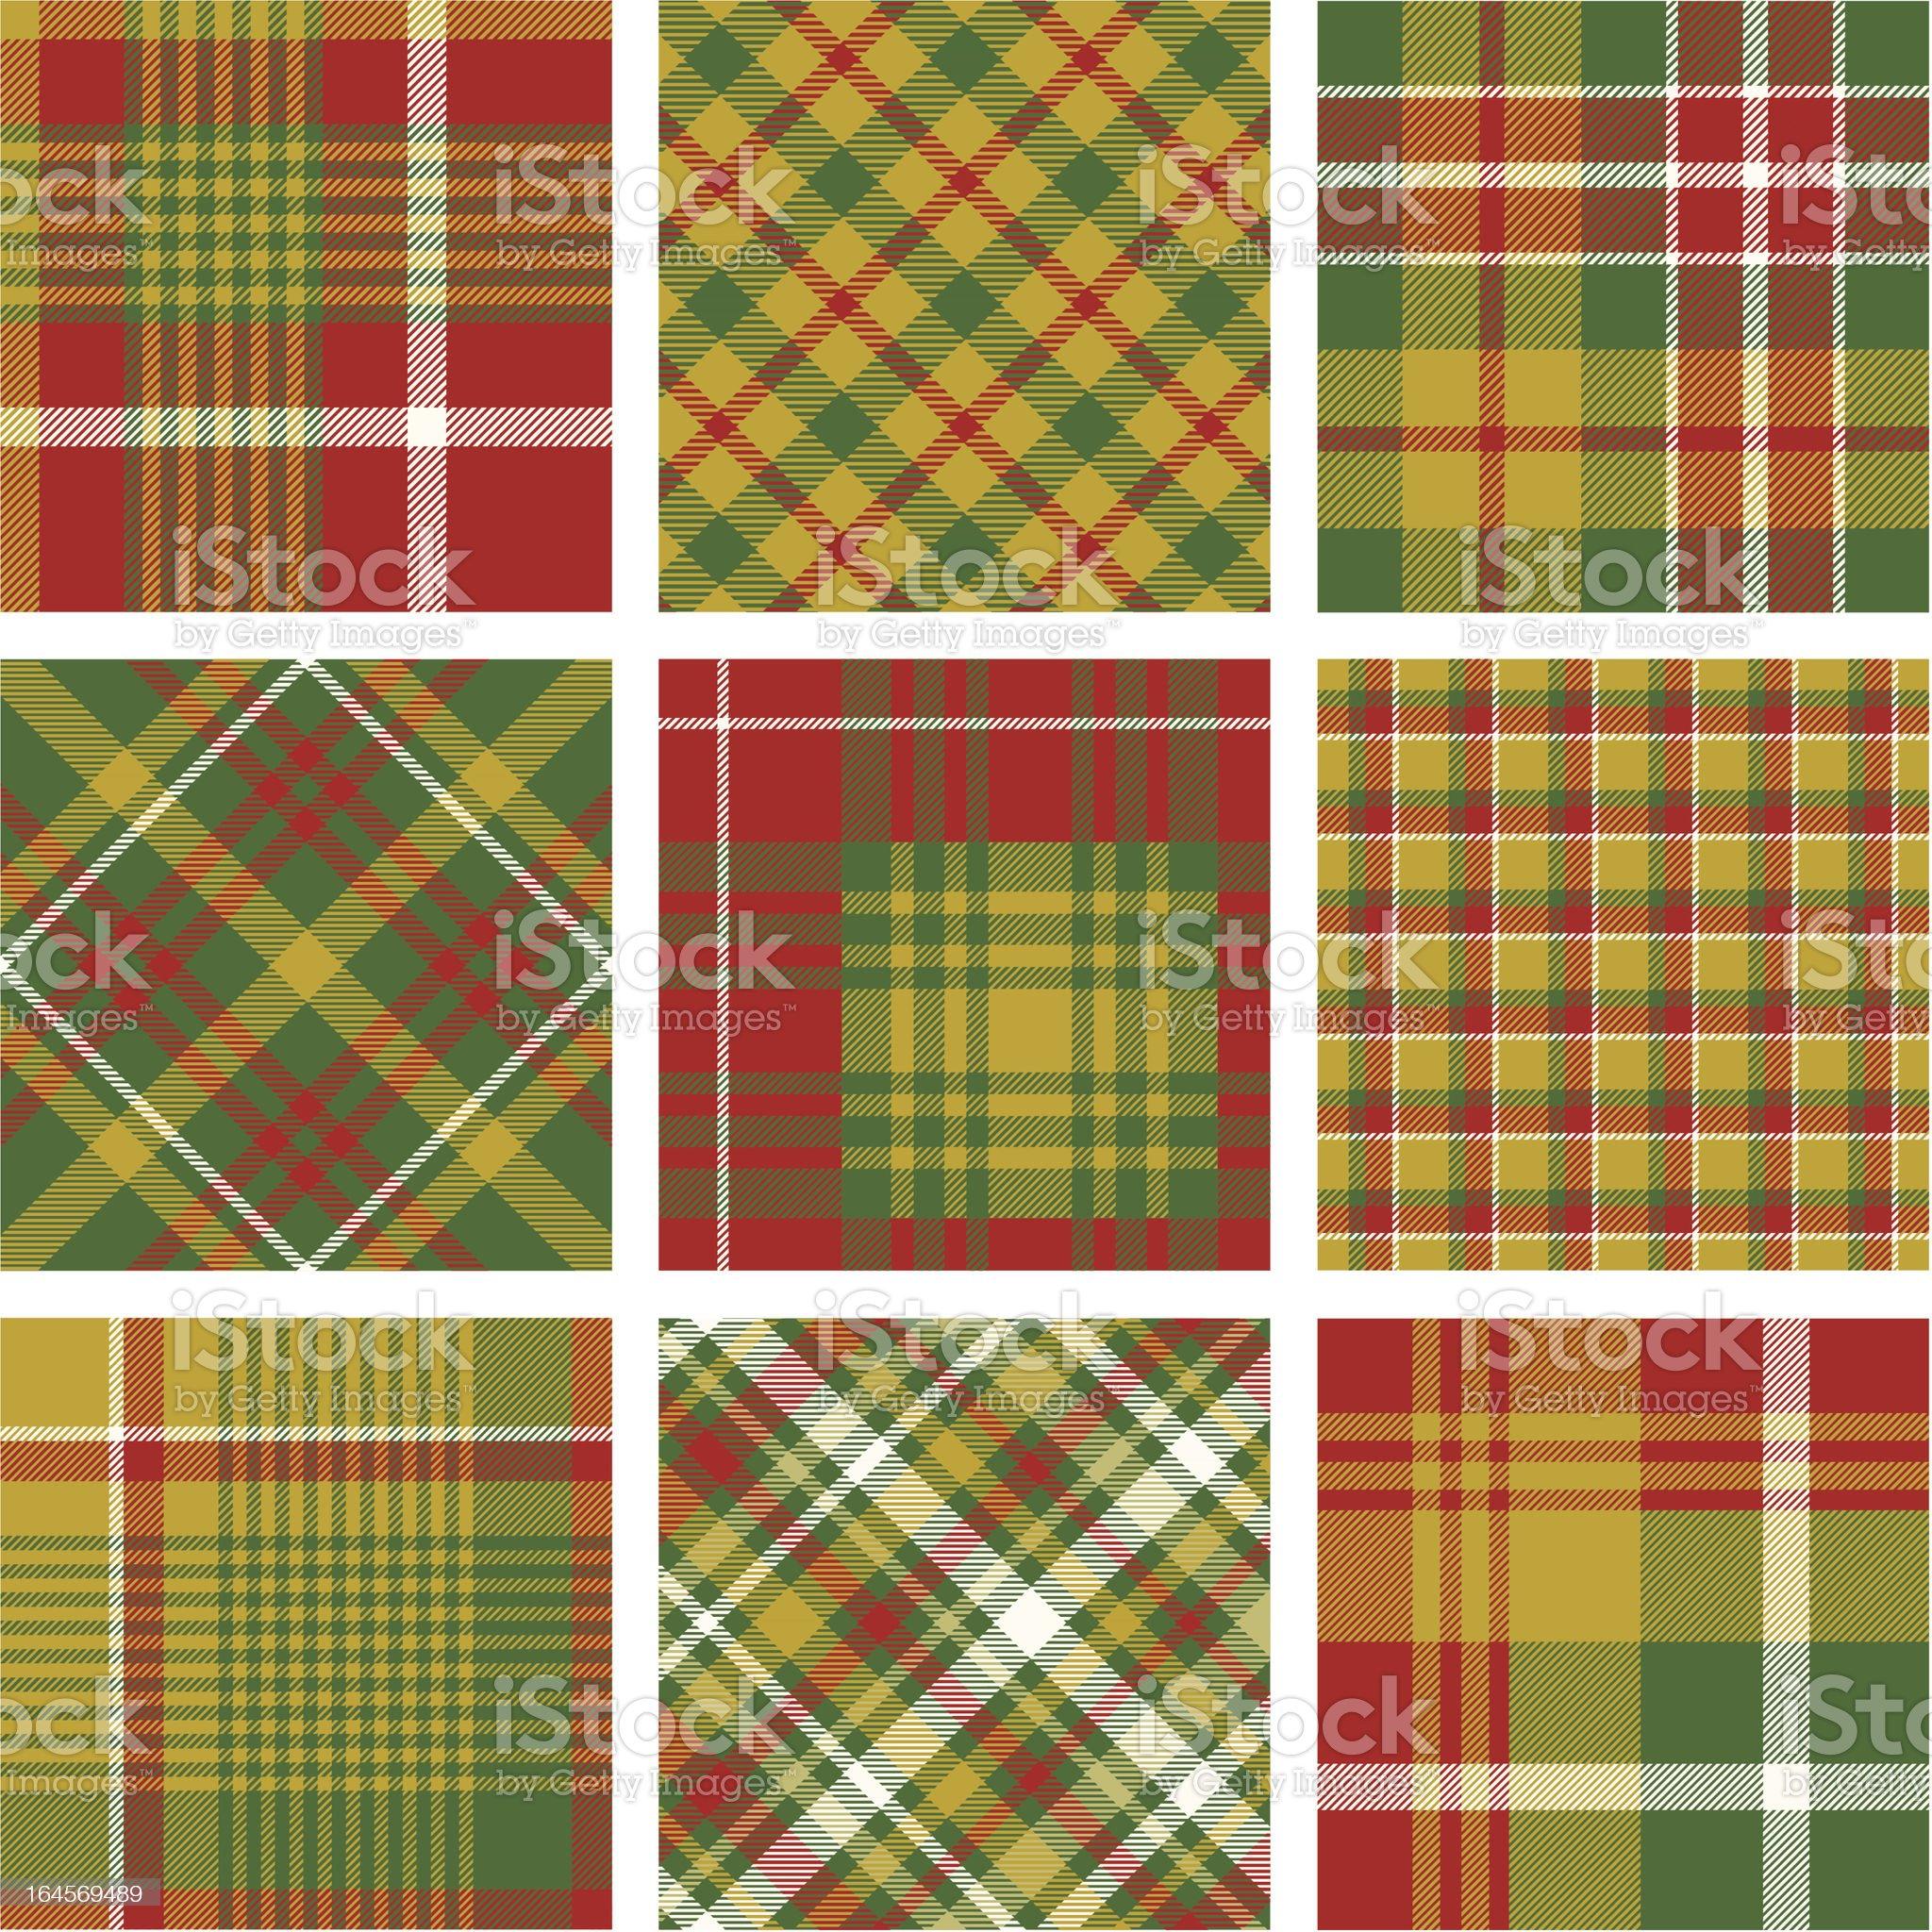 Christmas plaid patterns royalty-free stock vector art